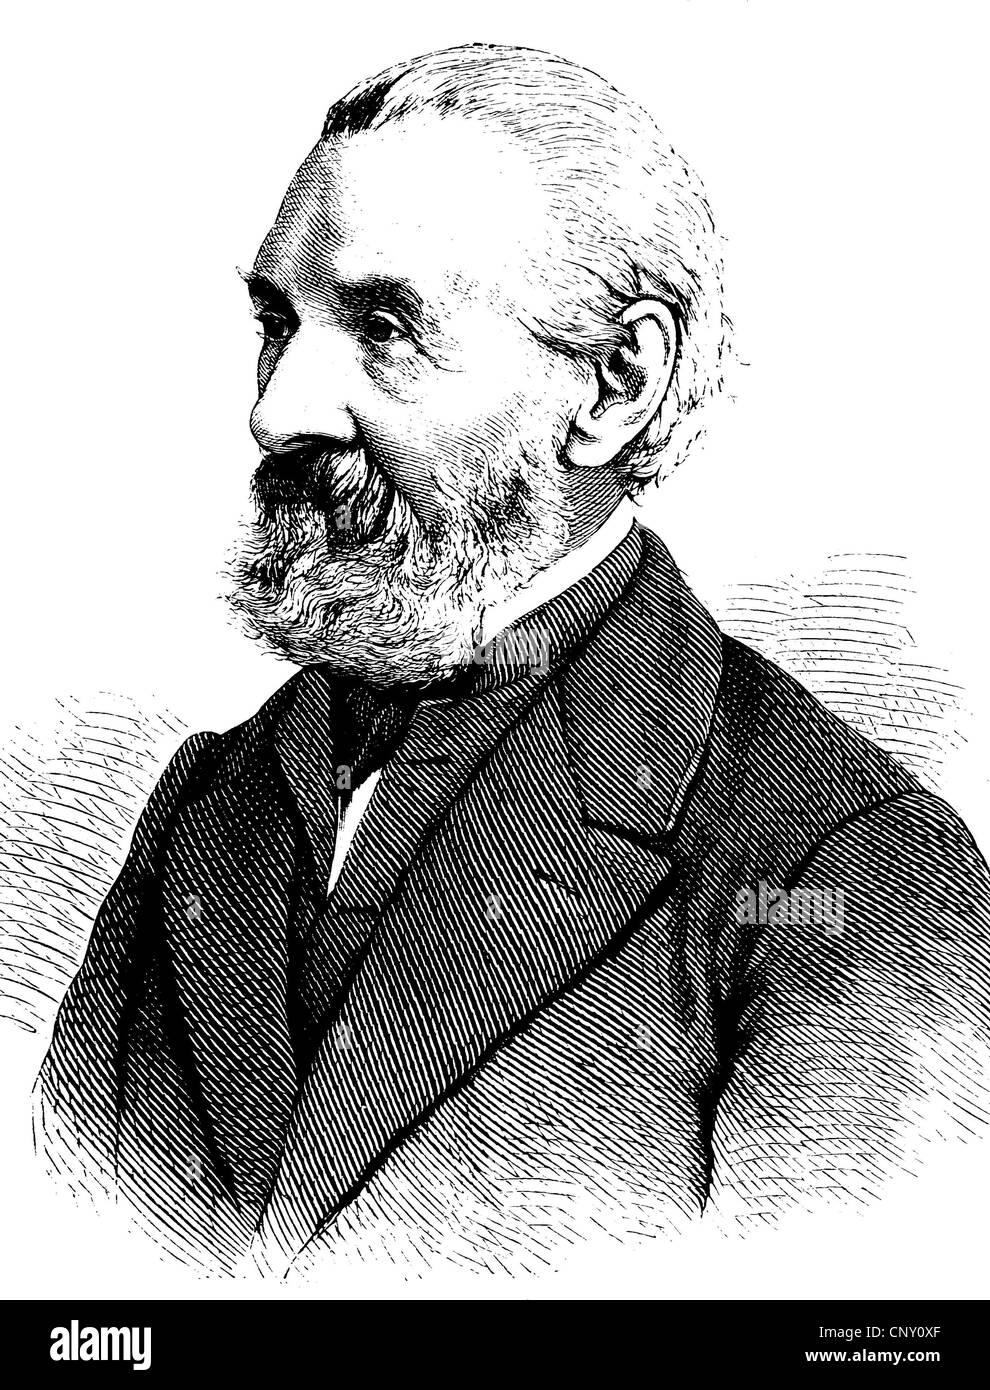 Ernst Heinrich Carl von Dechen, 1800 - 1899, un professore di ingegneria mineraria e inventore, storica incisione, Immagini Stock